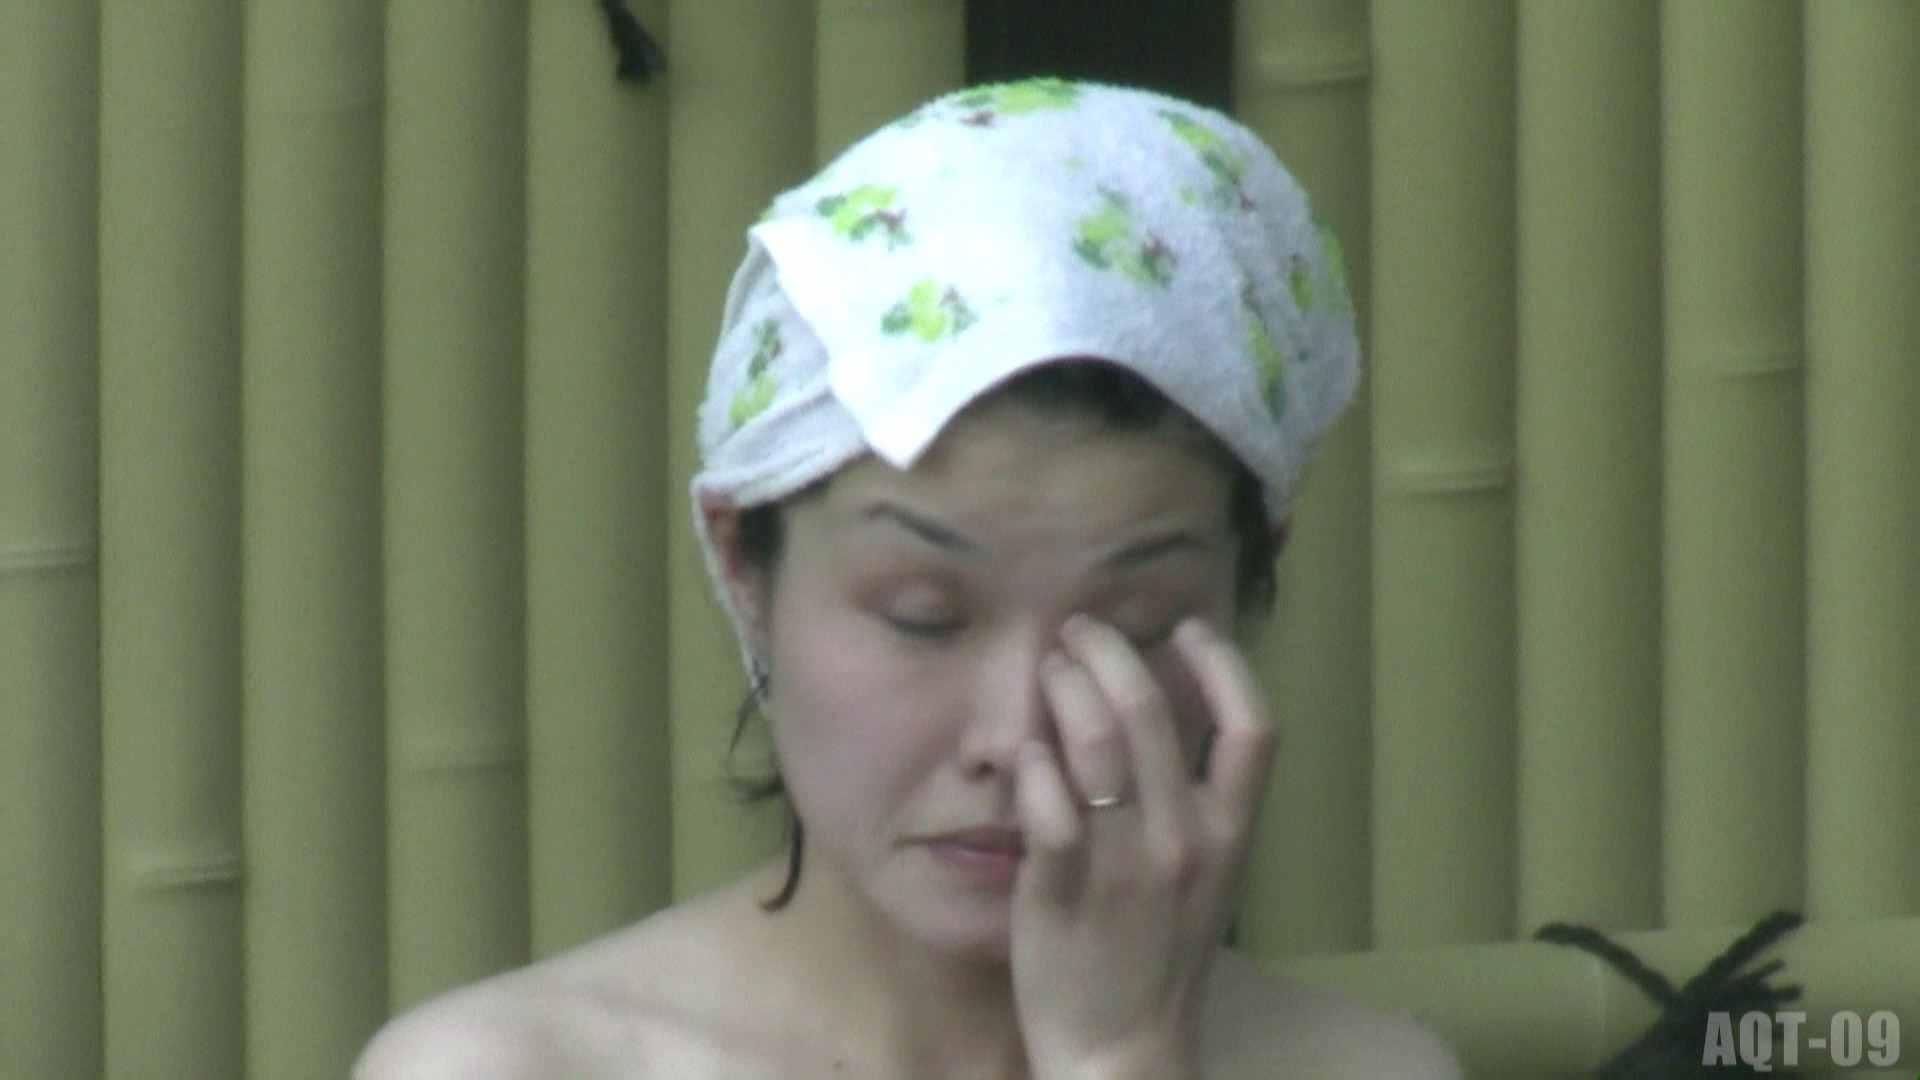 Aquaな露天風呂Vol.786 OLセックス | 盗撮  74画像 64